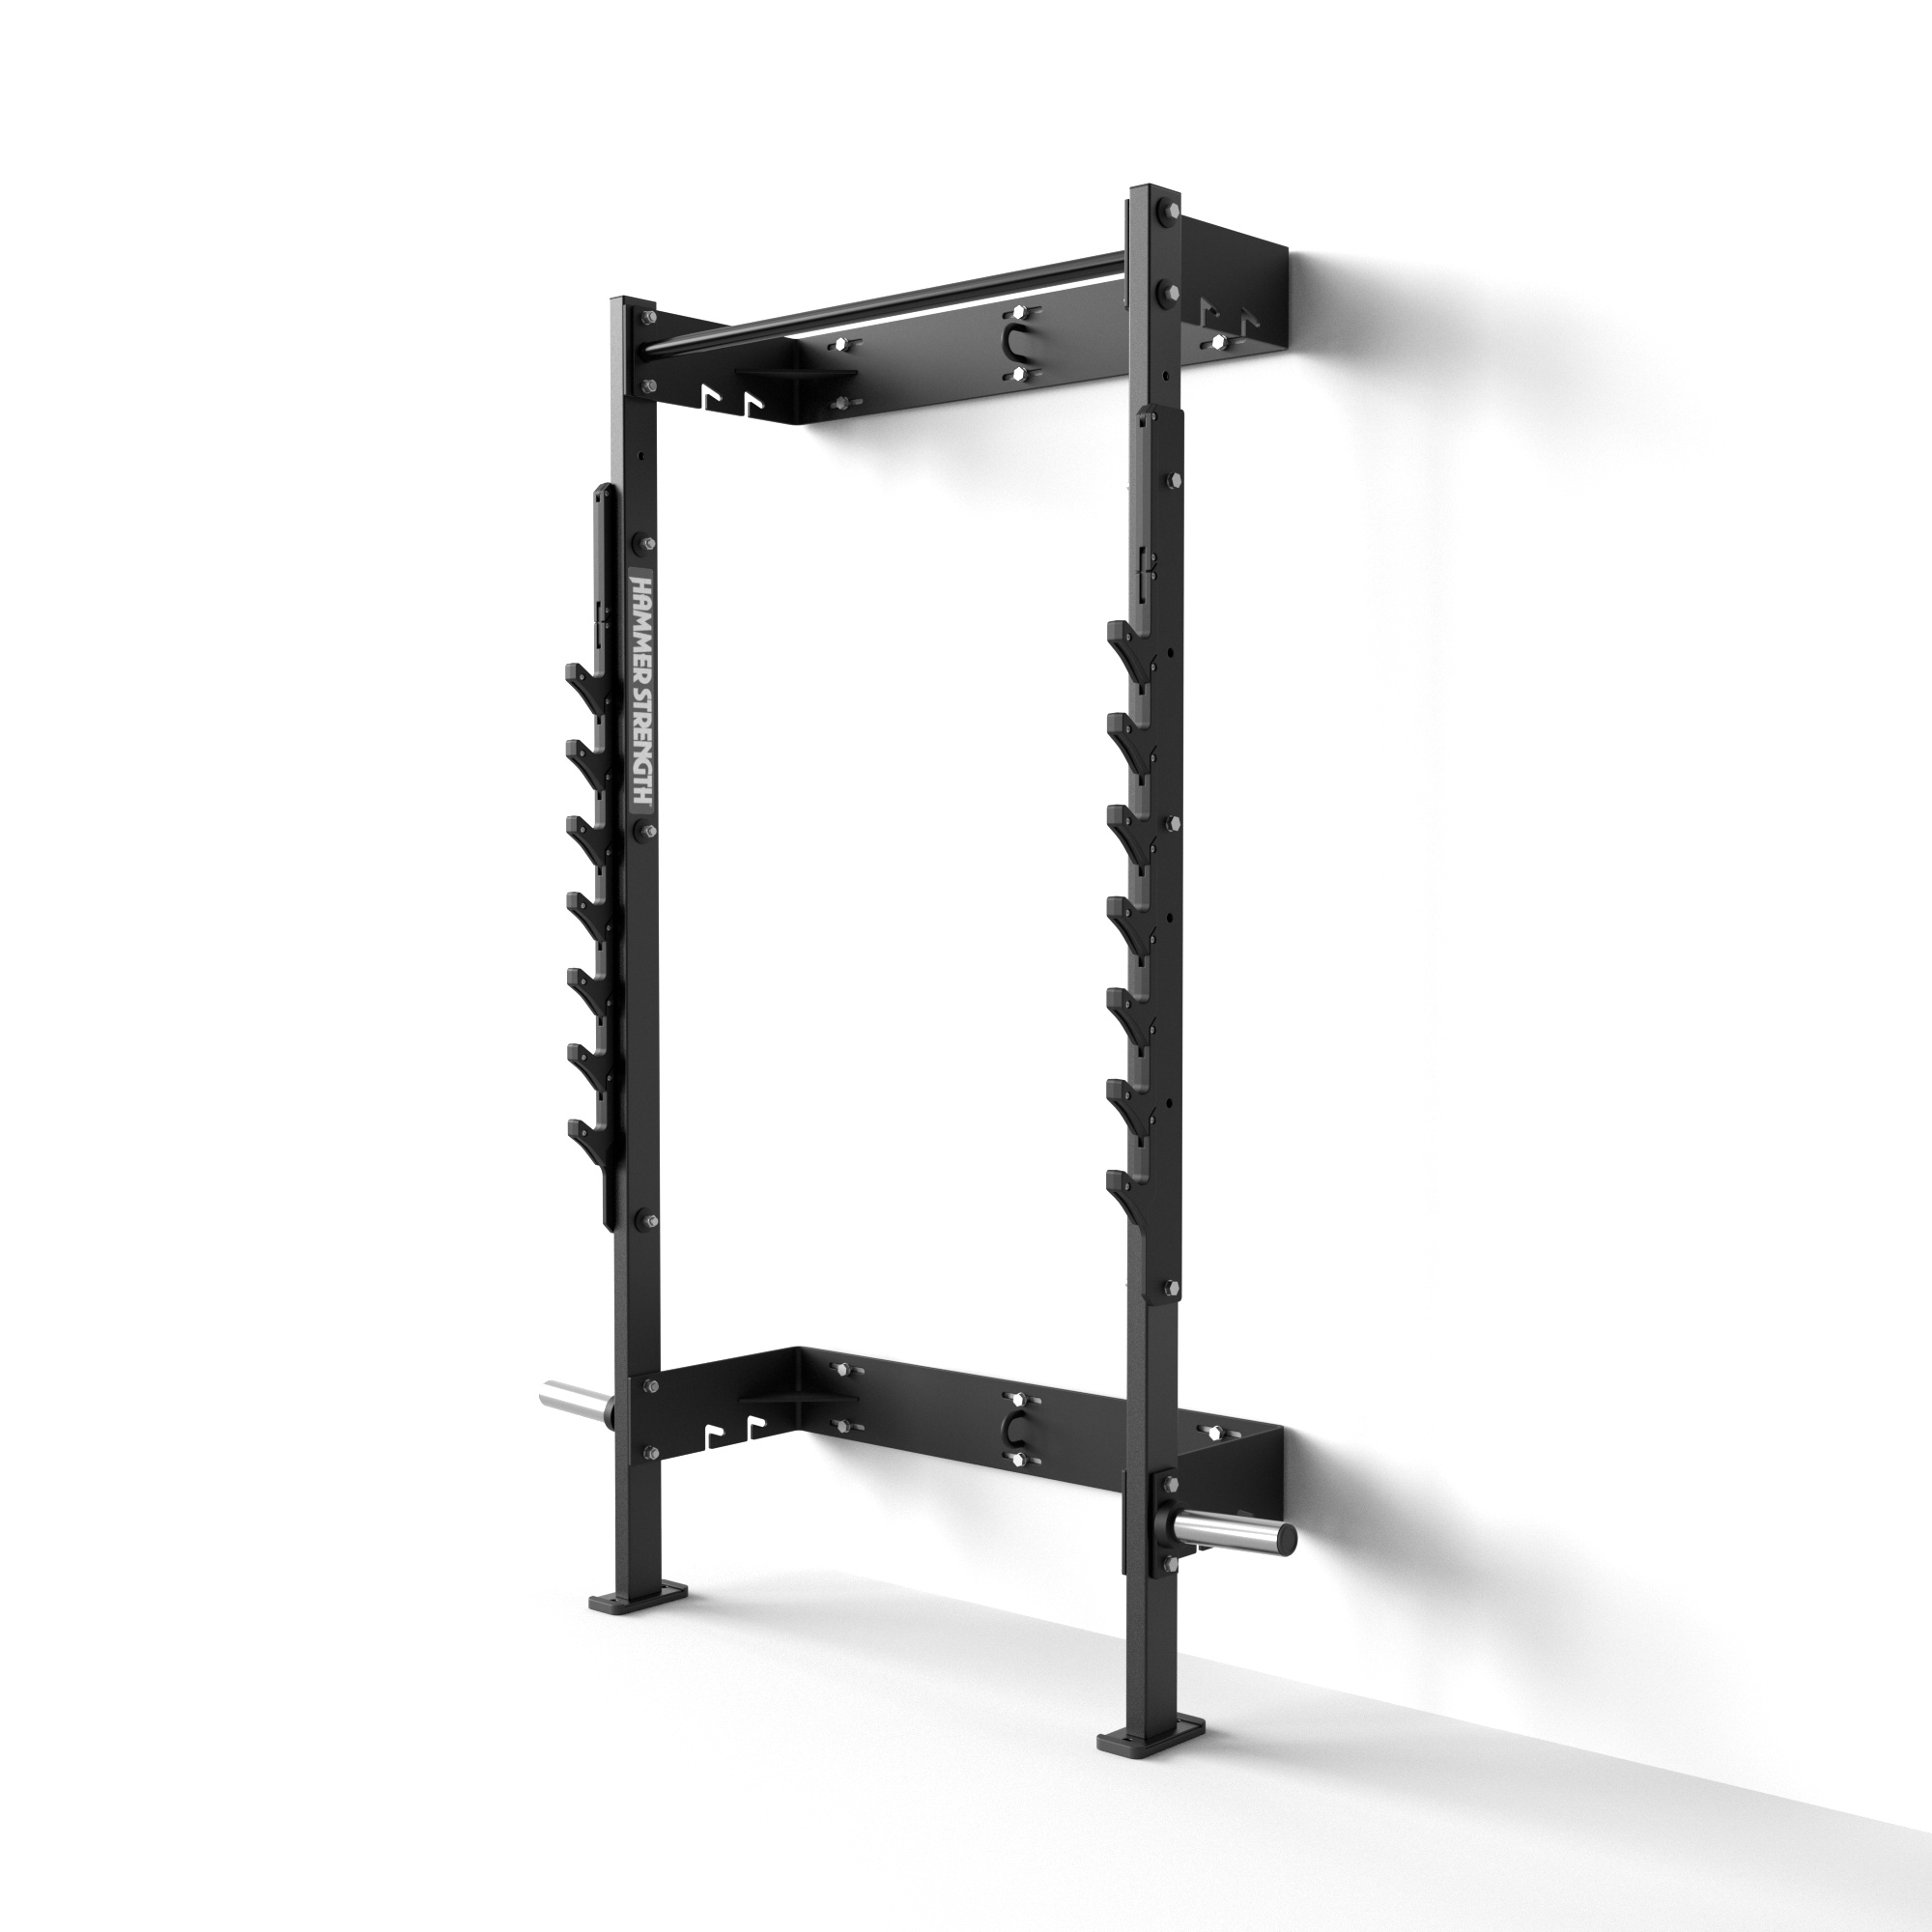 Hammer Strength Home Squat Rack | Life Fitness Store